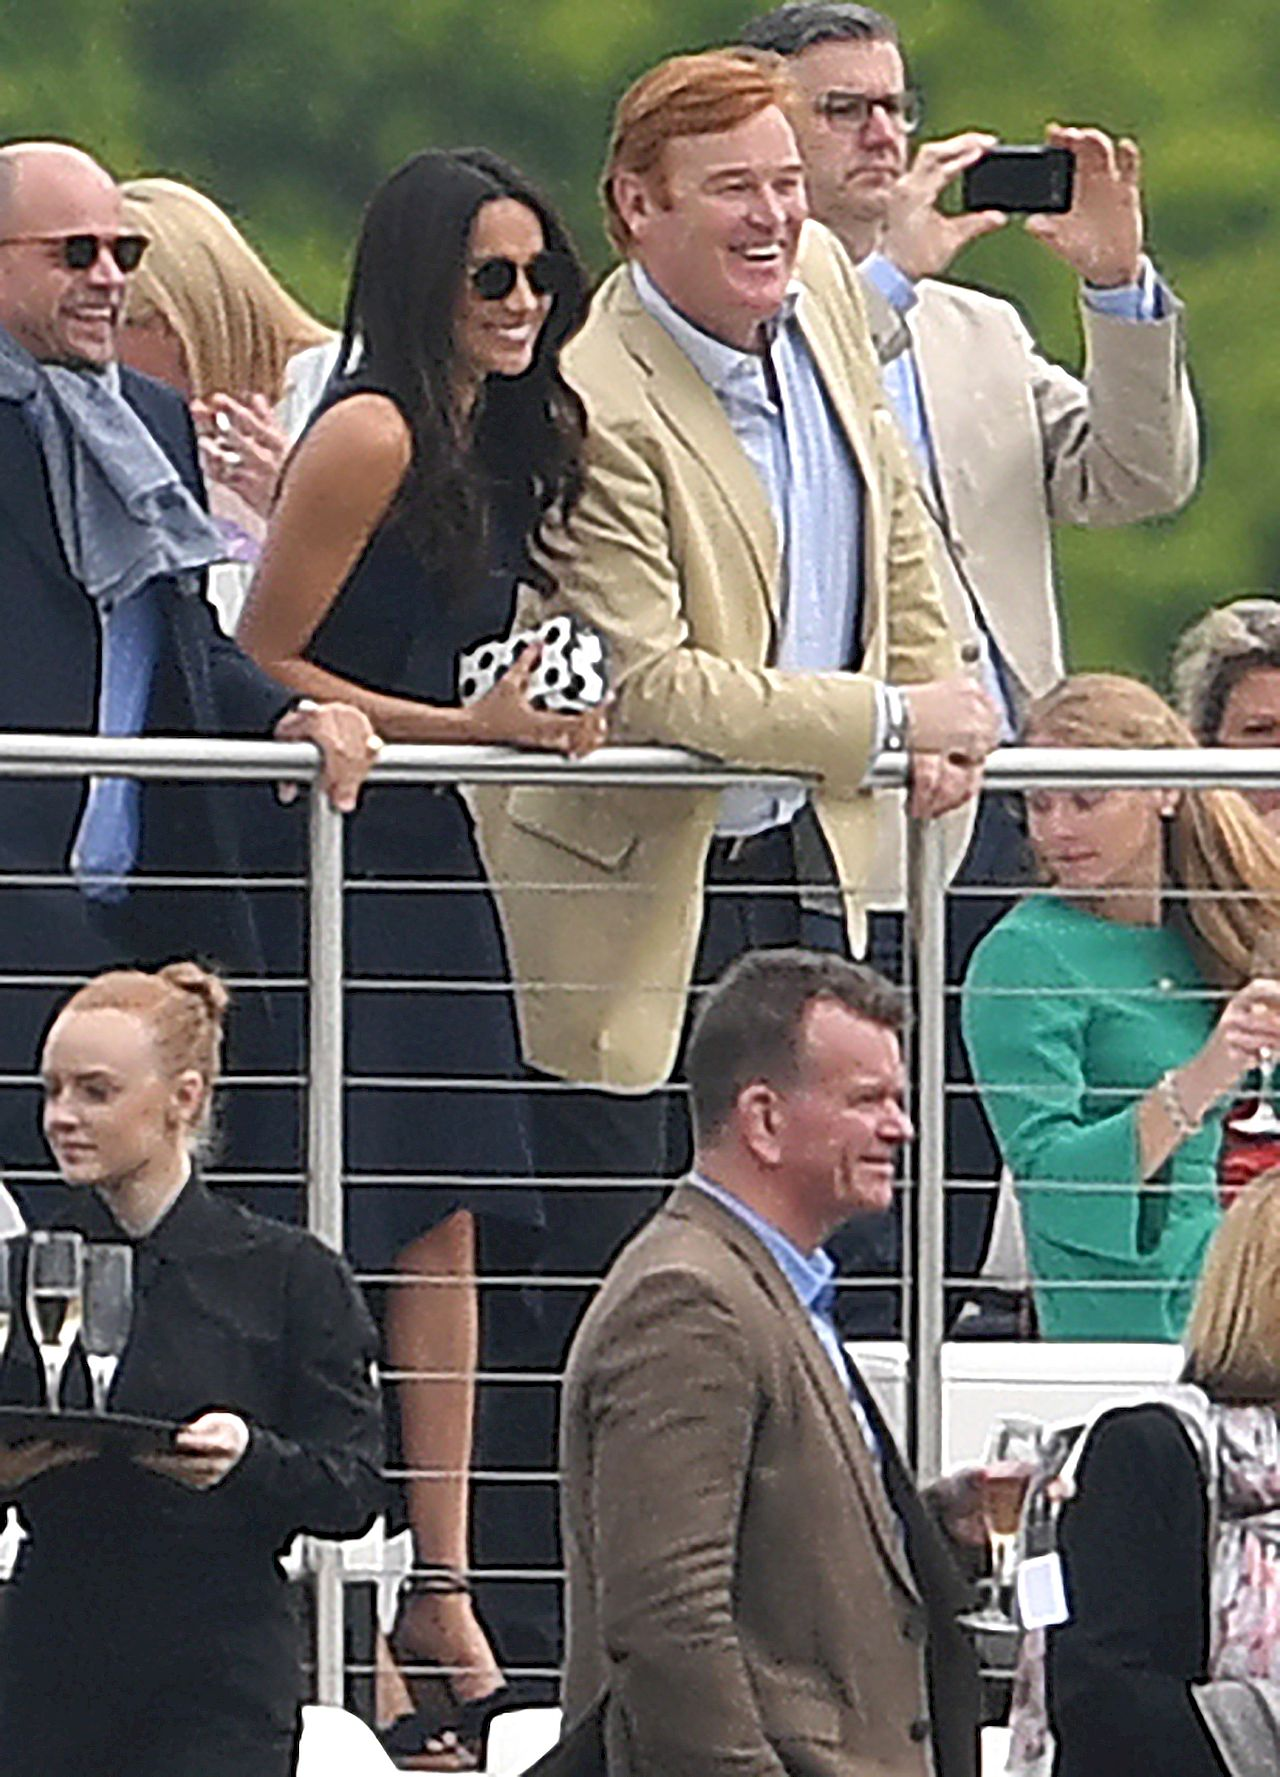 Meghan Markle watches Prince Harry play polo